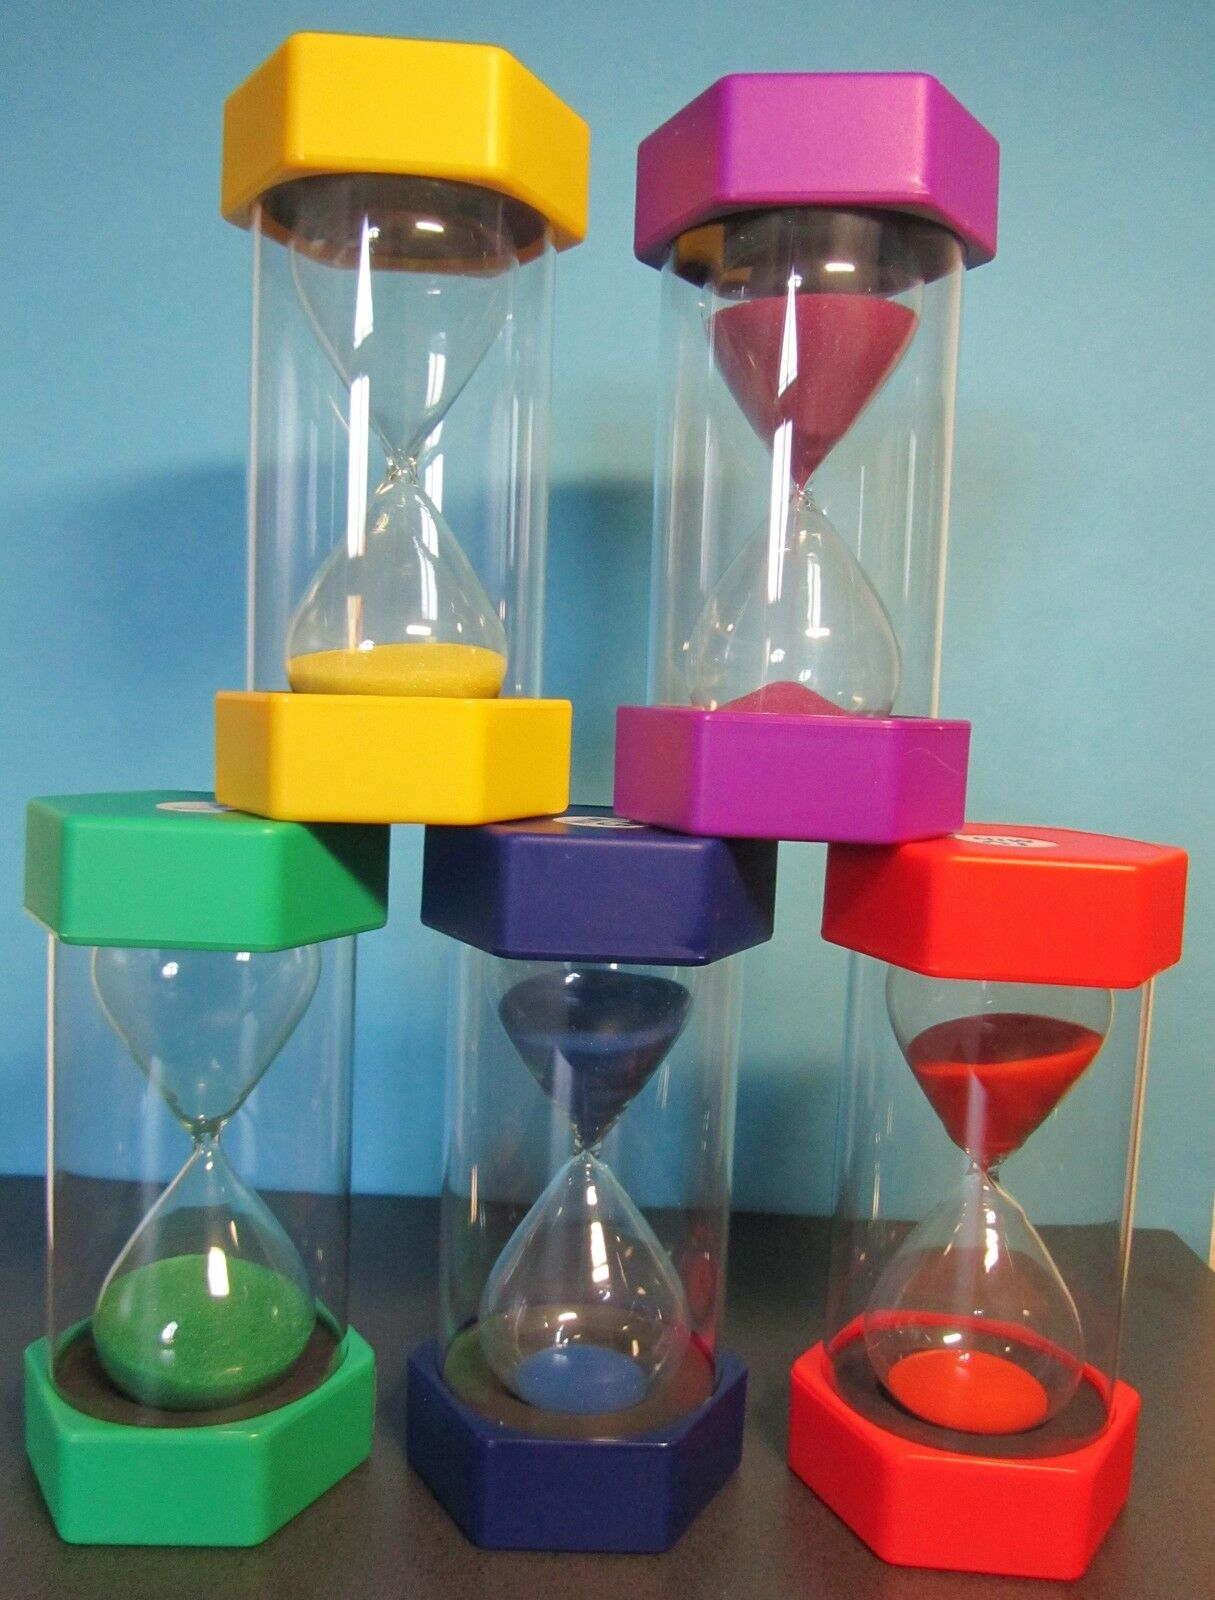 Sanduhr Sanduhren Eieruhren Experimentieren Höhe 16cm 5er Set  5er-Set